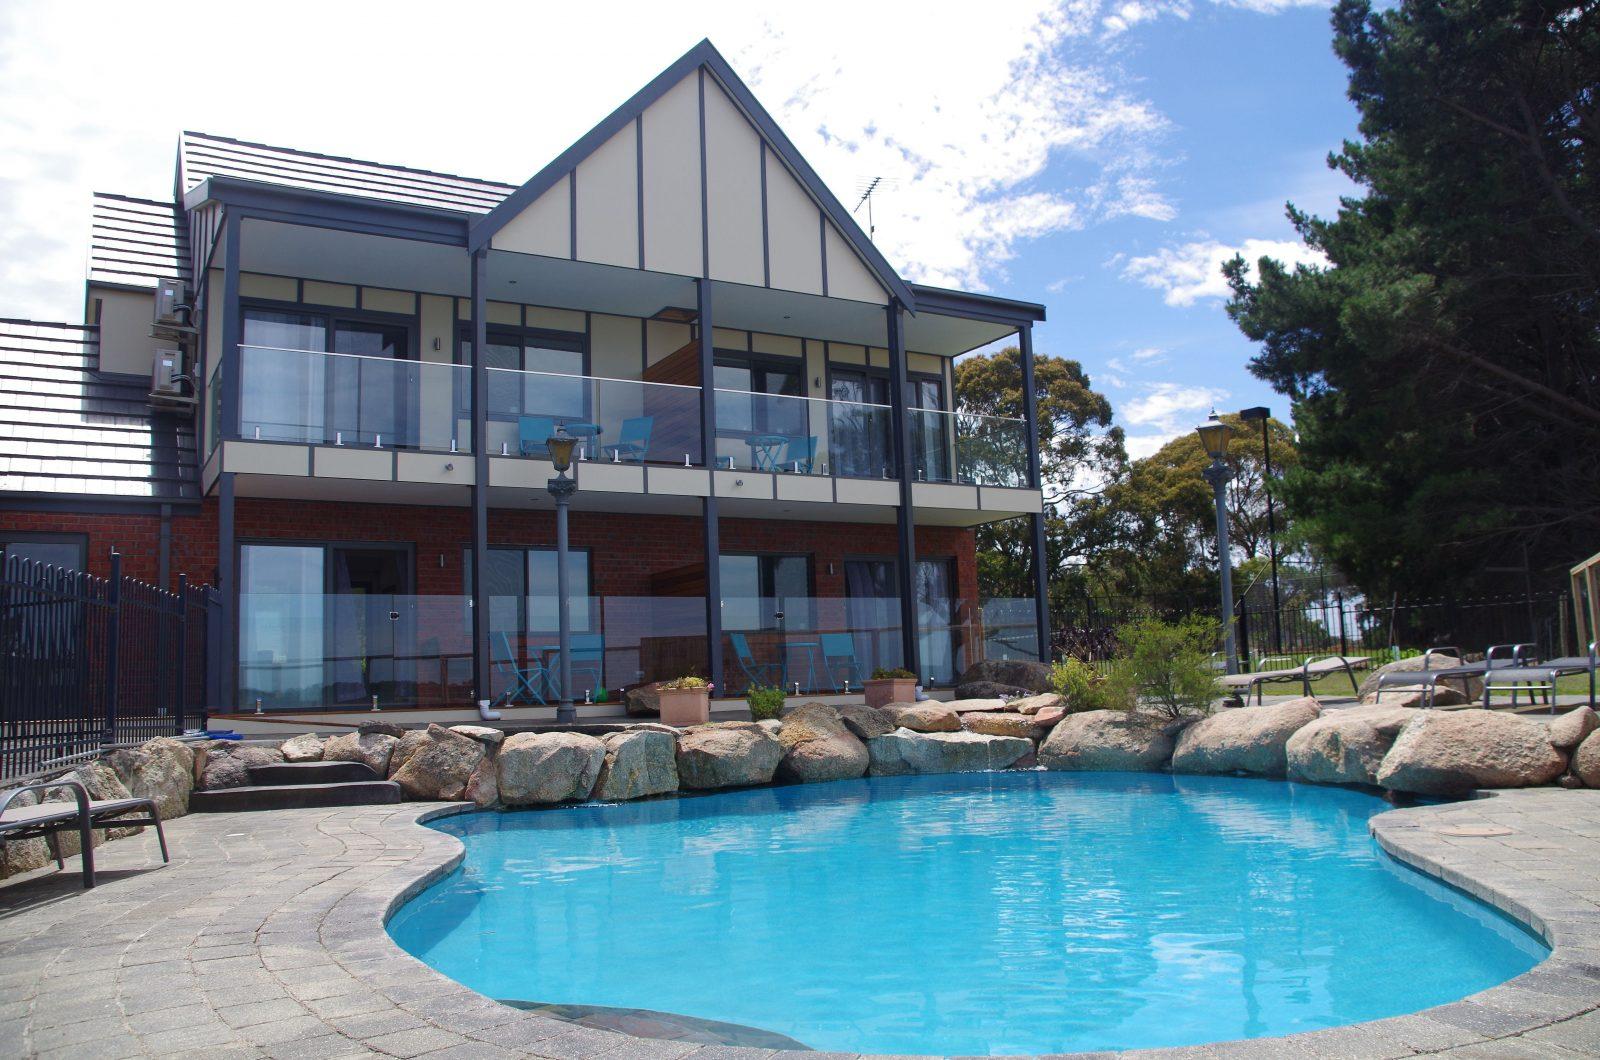 rooms pool side